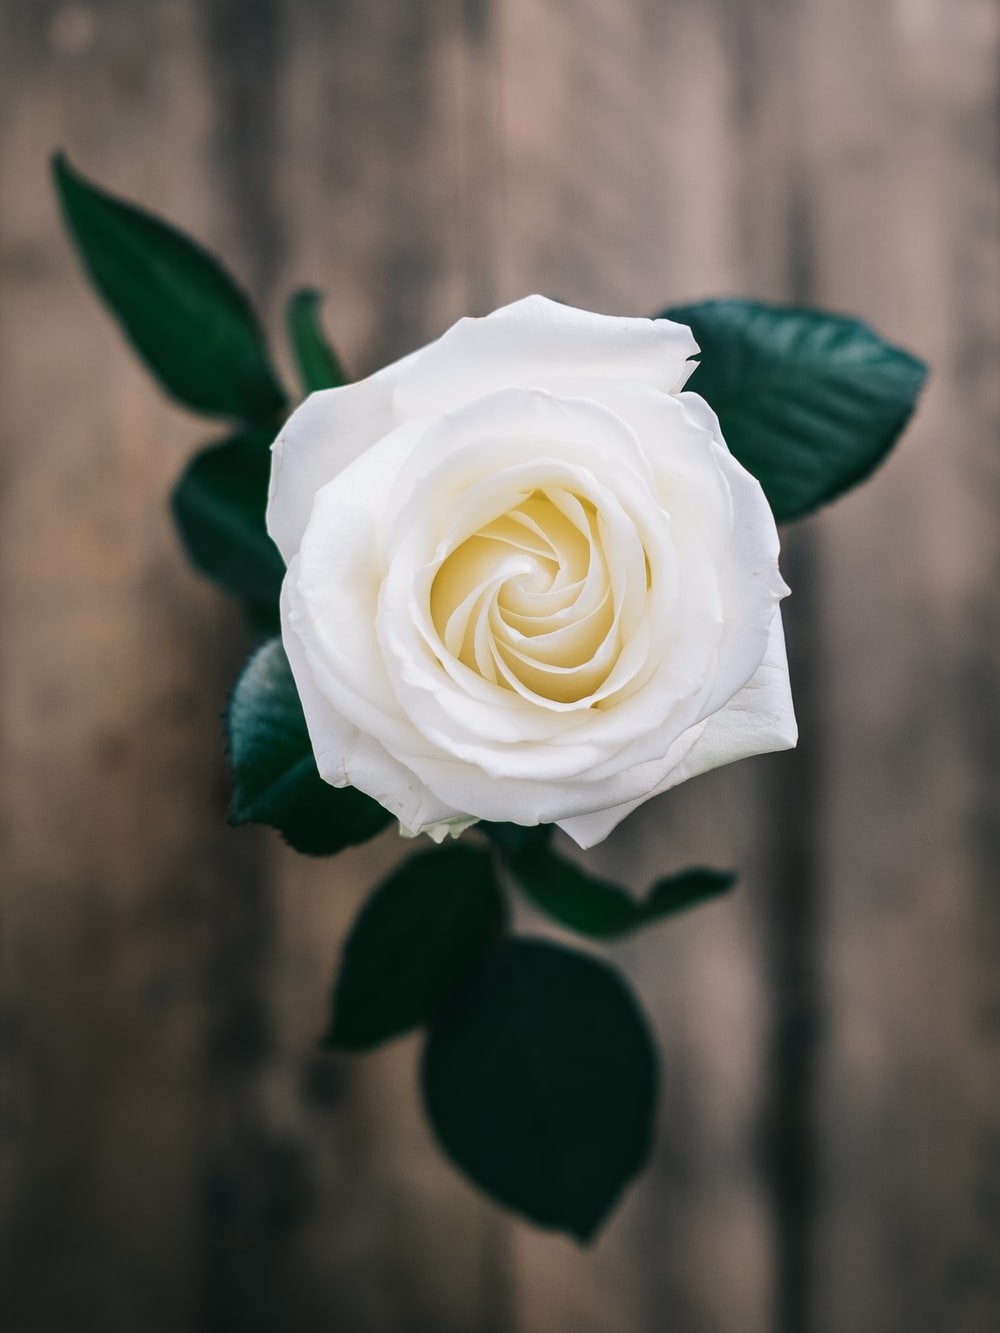 Flower Rose Blossom And Flower Bloom Hd Photo By Annie Spratt